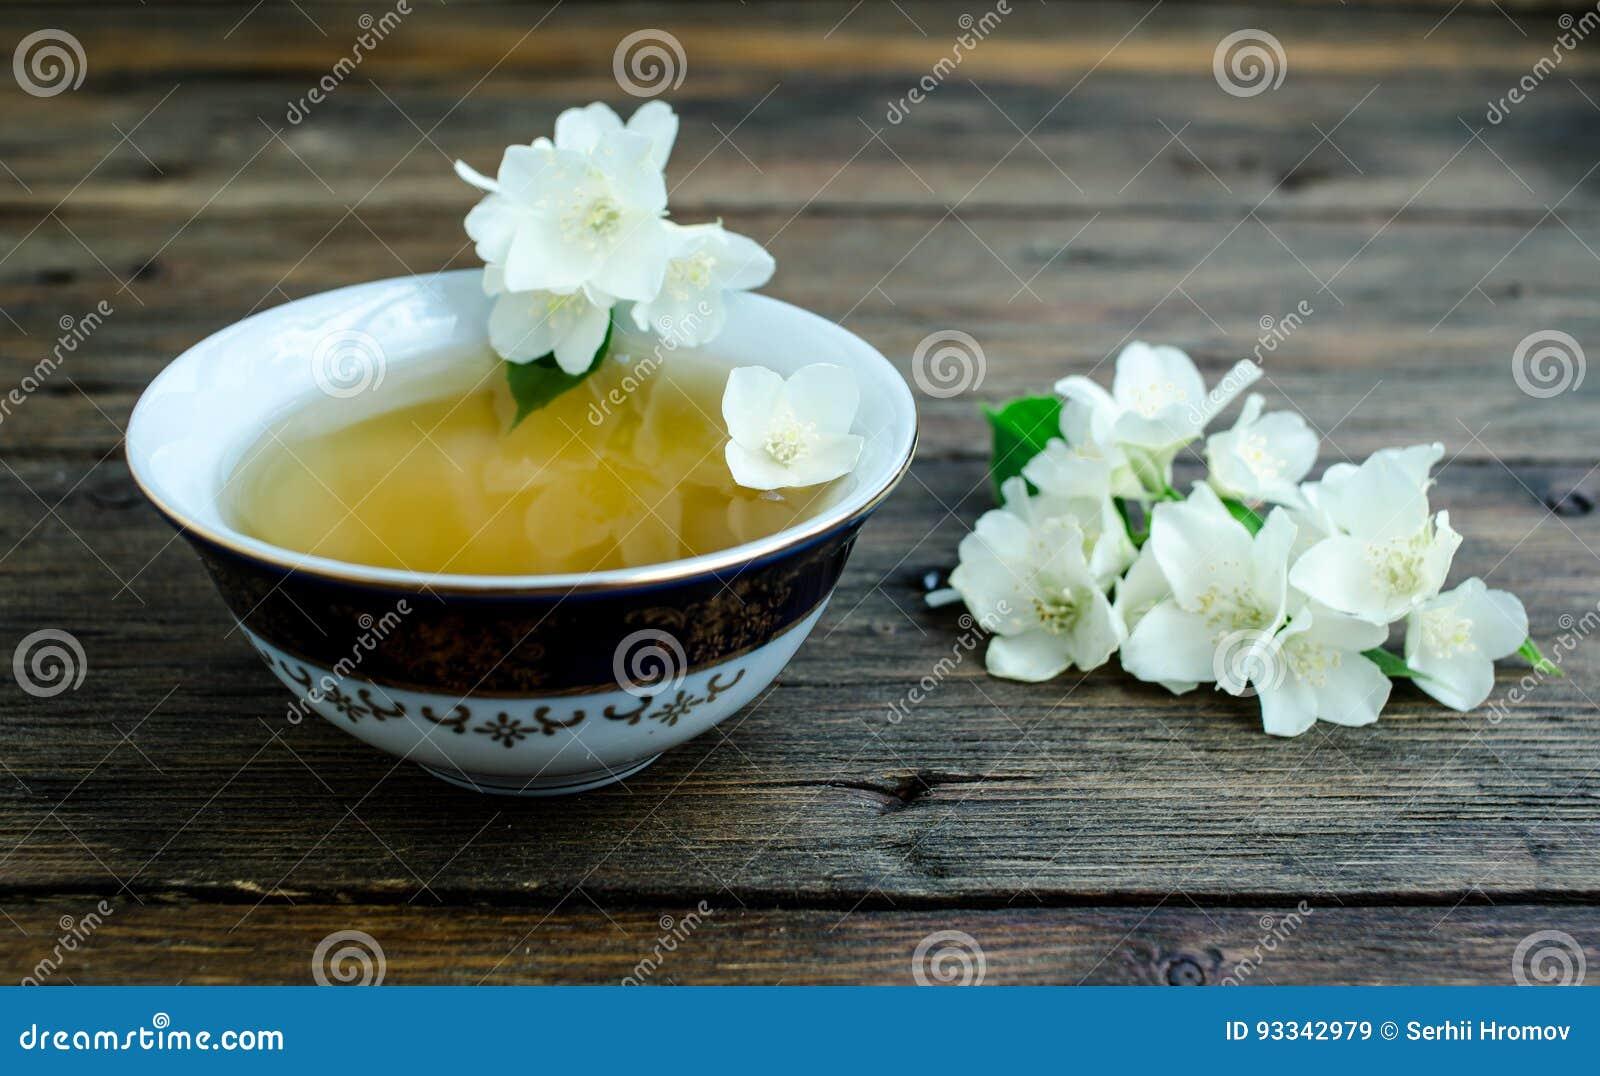 Jasmine Tea With Jasmine Flowers On Wooden Background Stock Image